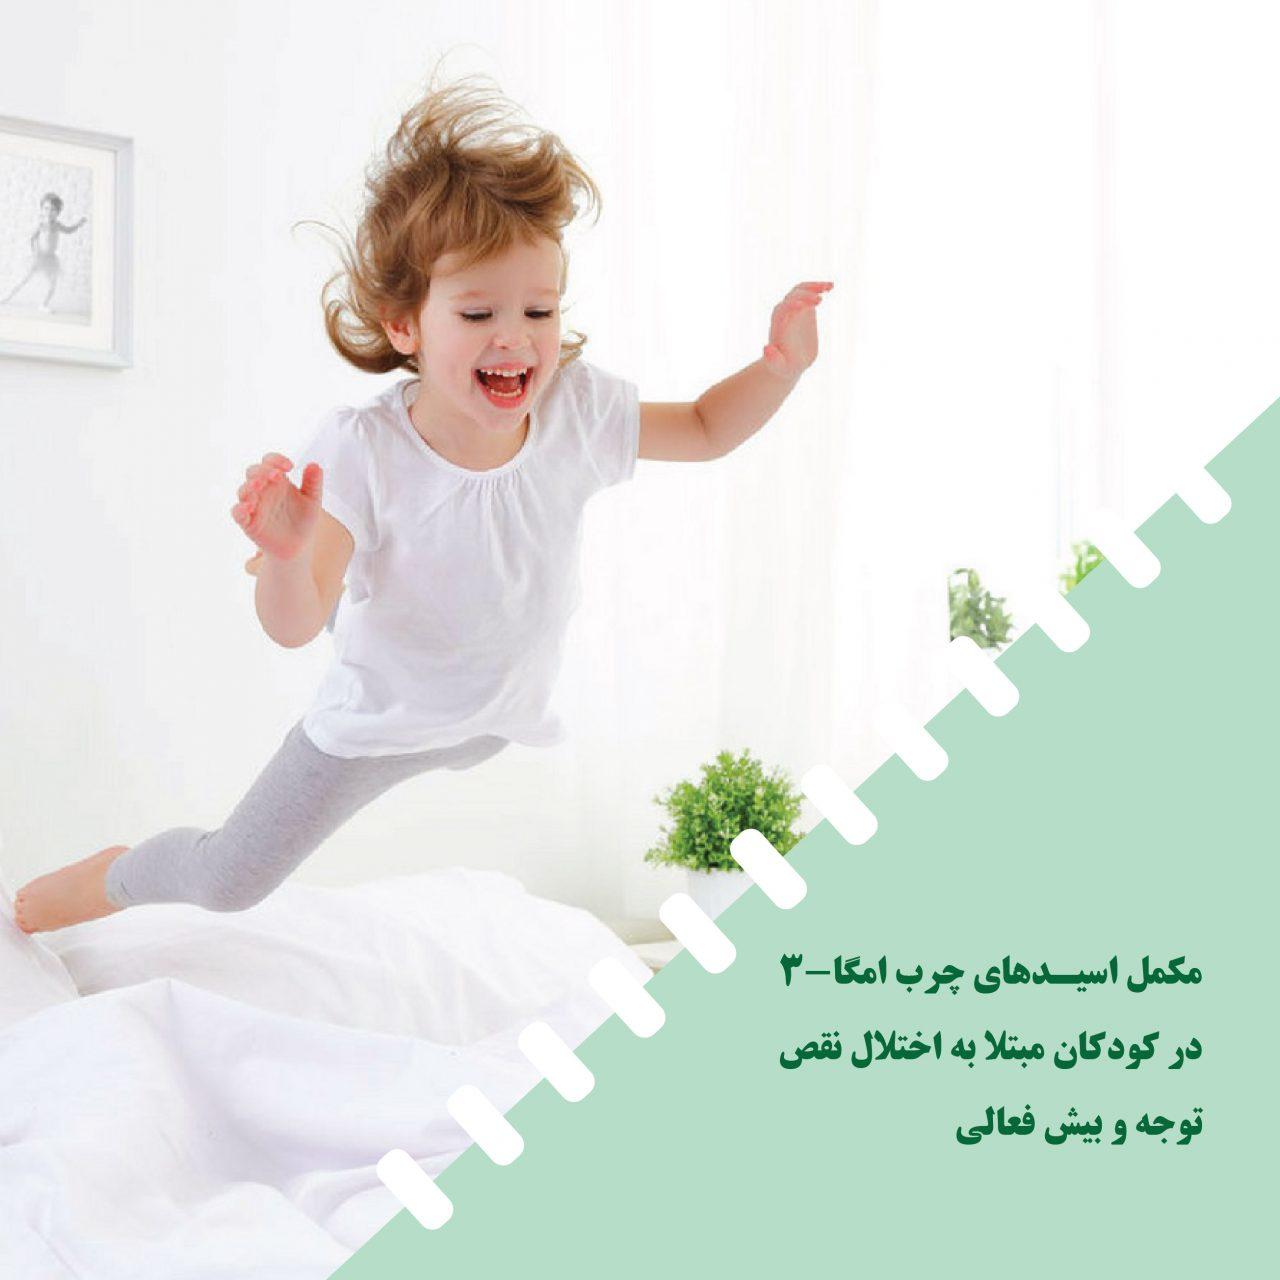 http://hakimanteb.com/wp-content/uploads/2020/12/post_hakiman_MOKAMEL_ASIDHAYE_charbe_omega3_dar_kodaan_mobtala_be-1280x1280.jpg